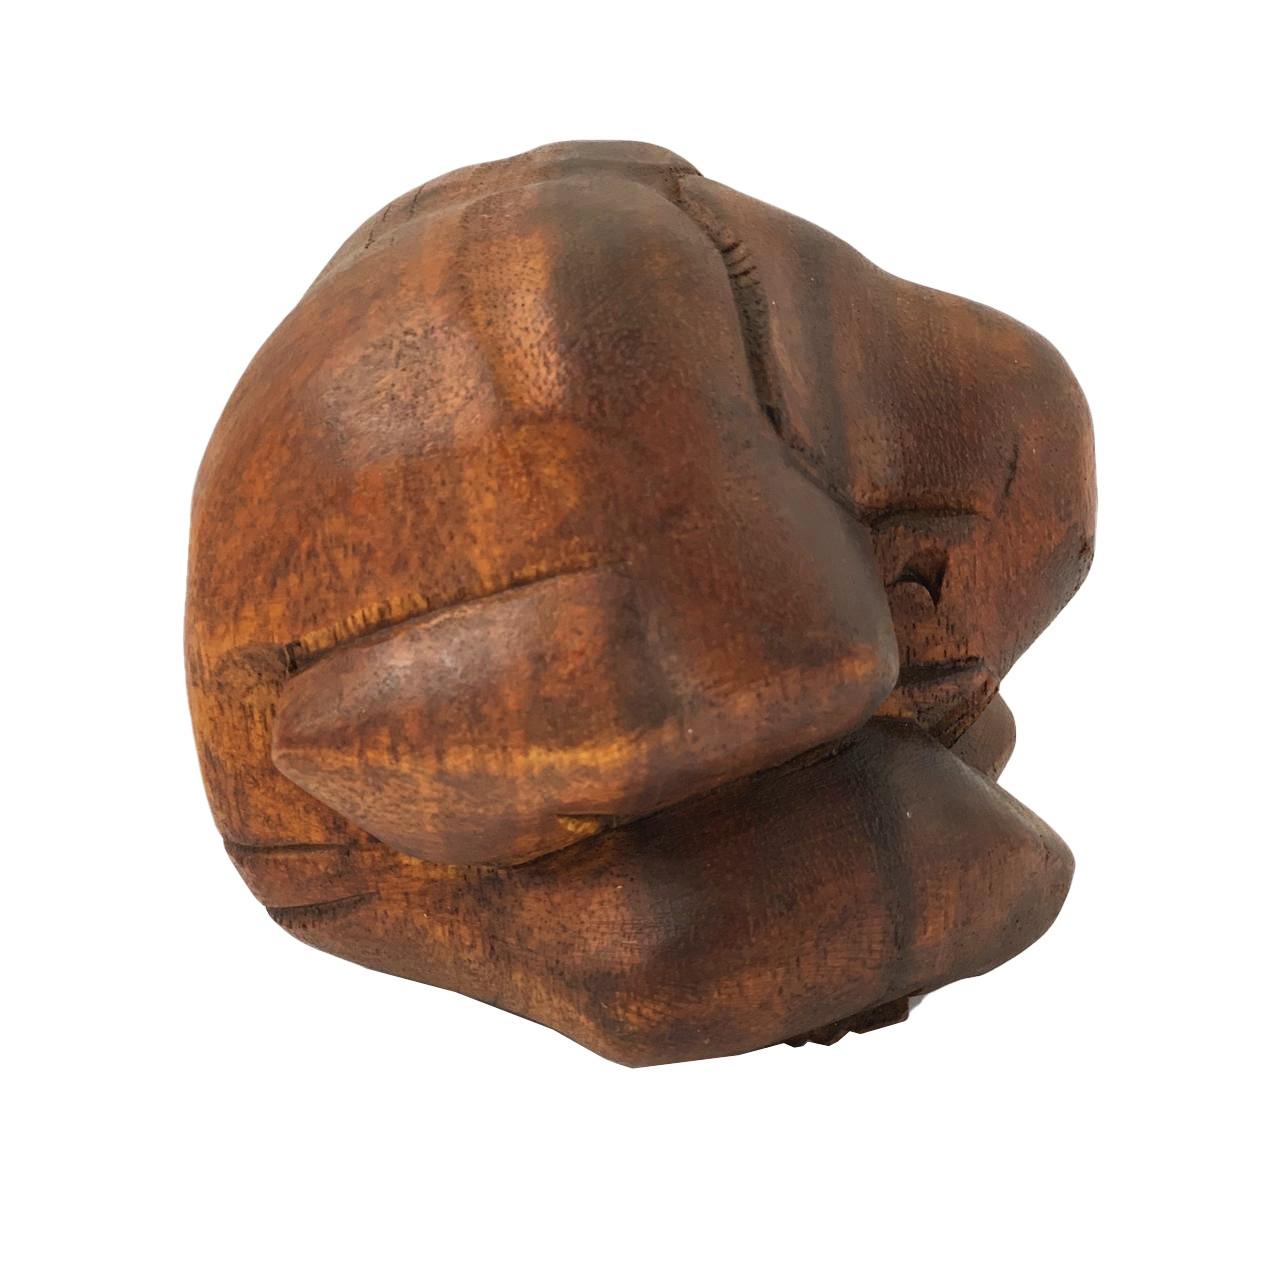 Esculturas Monge Yogi Encolhido ( 12 cm )